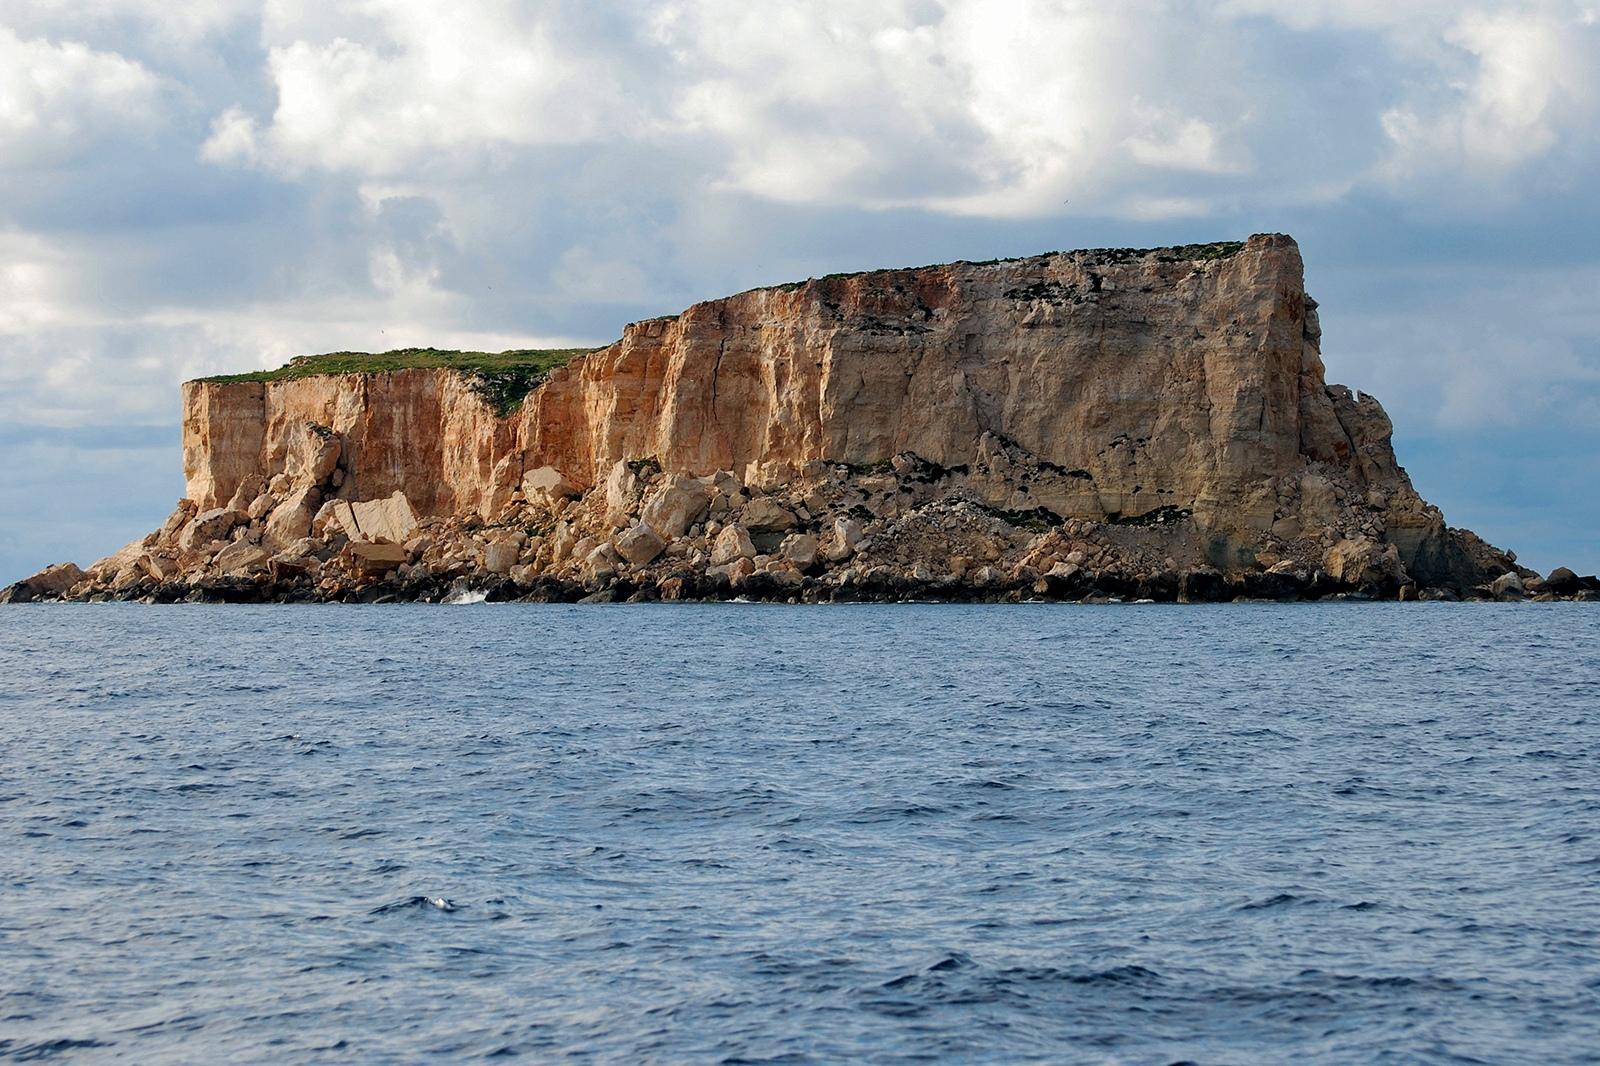 A tour around Filfla with Heritage Malta